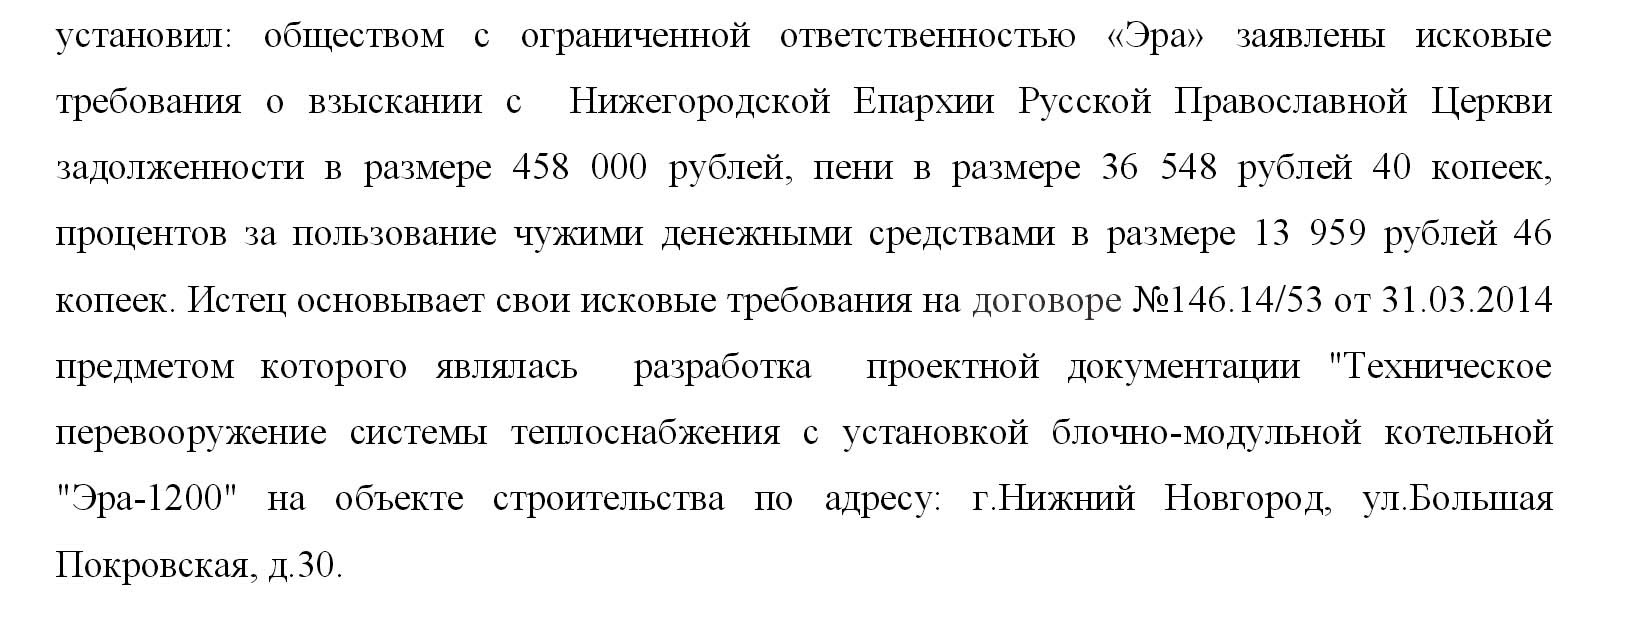 Про РПЦ и рпц-истов. - Страница 2 IJwmeKa2ZQuCfLJyB2QRwSwVCXs2b3